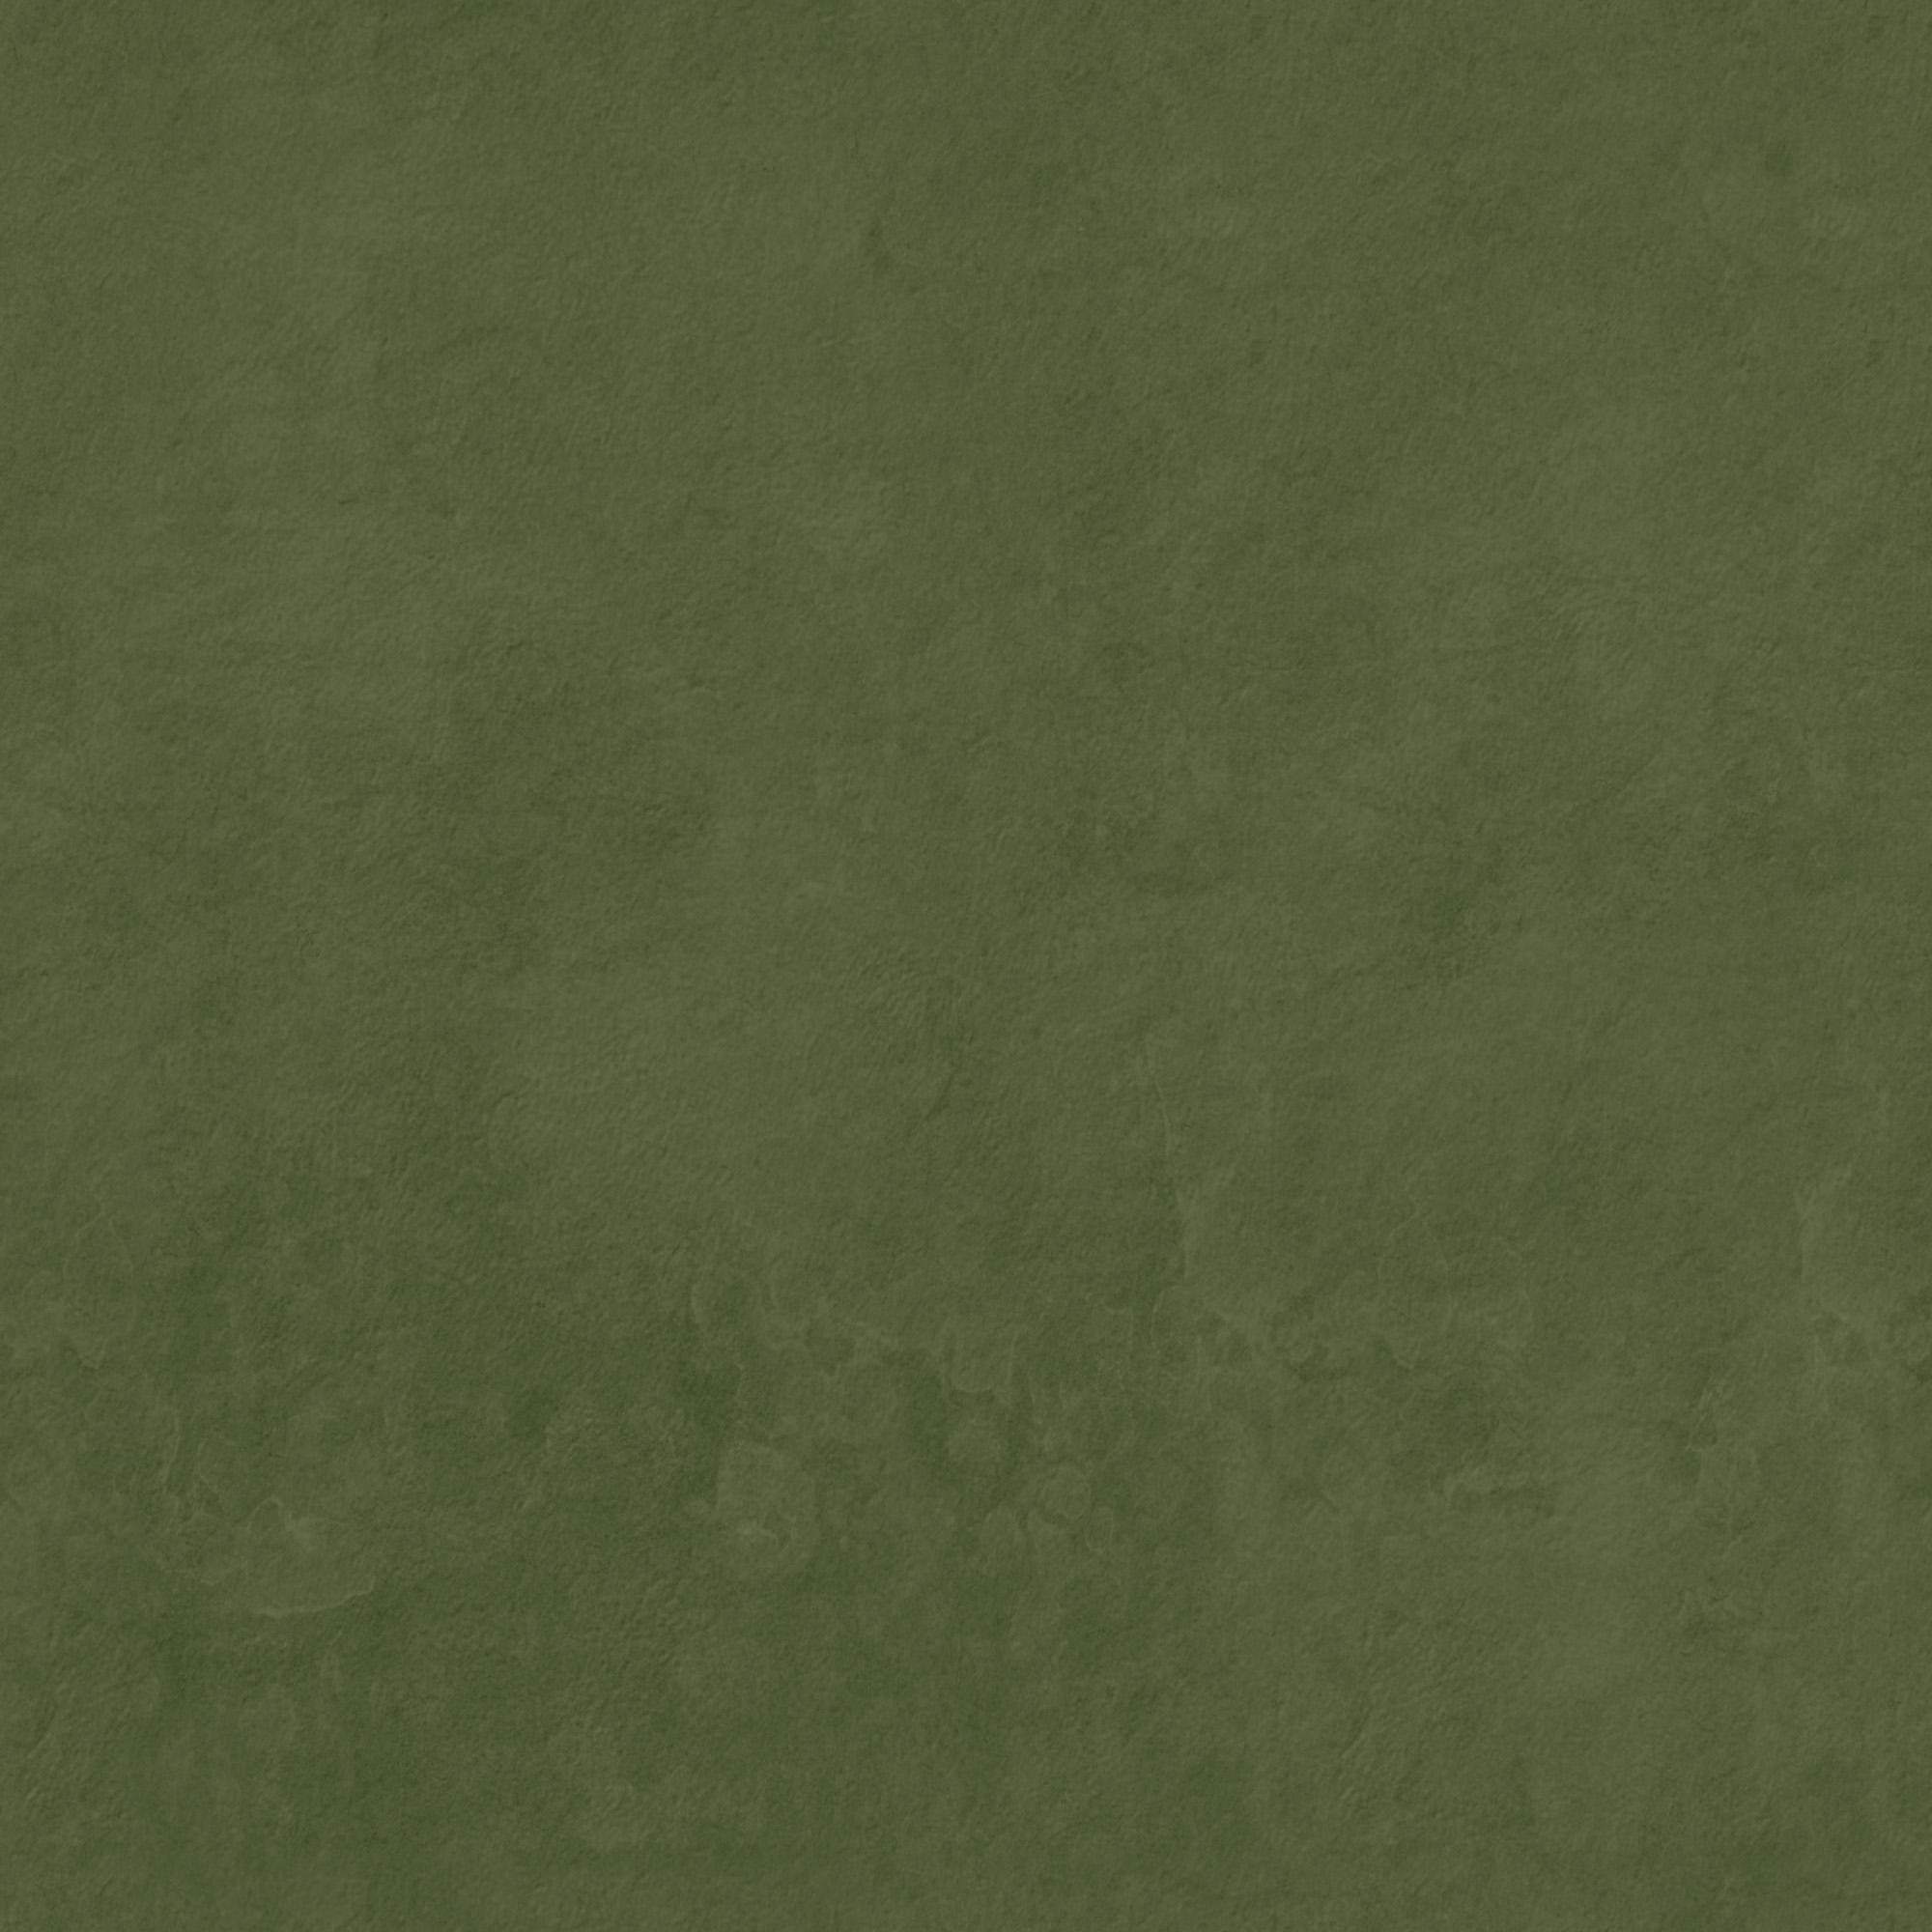 green grunge texture thumb - photo #30